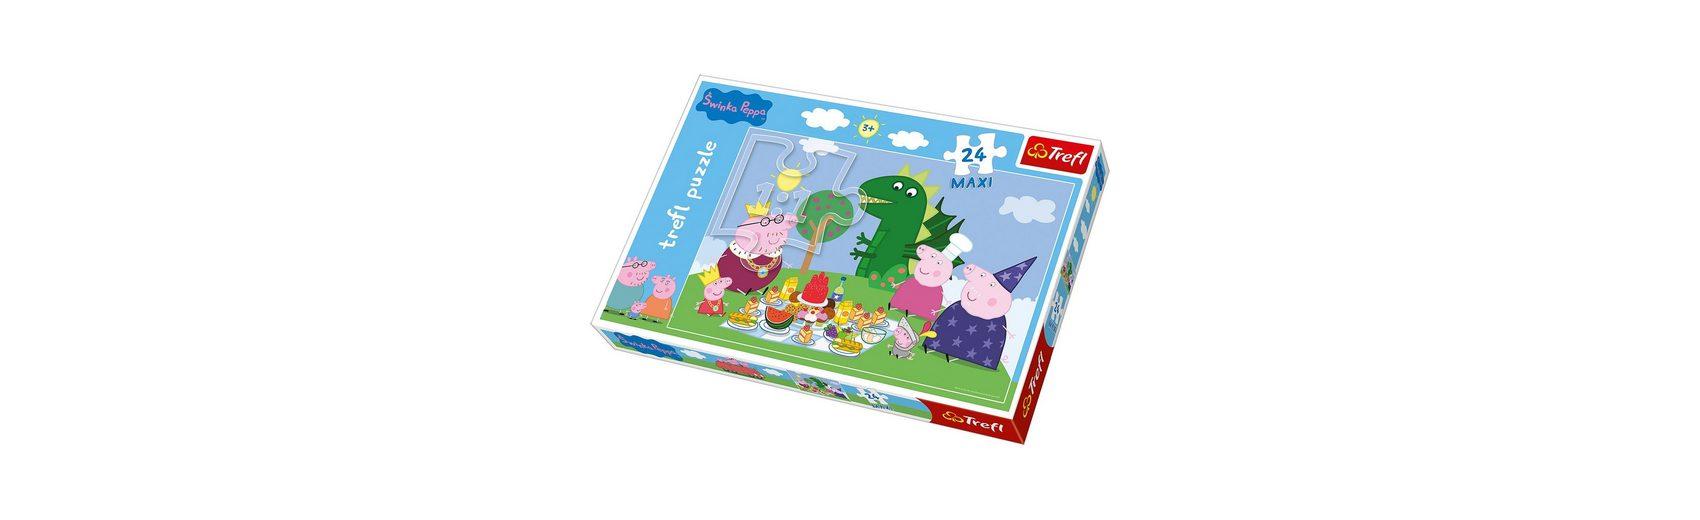 Trefl Maxi Puzzle - 24 Teile - Peppa Pig